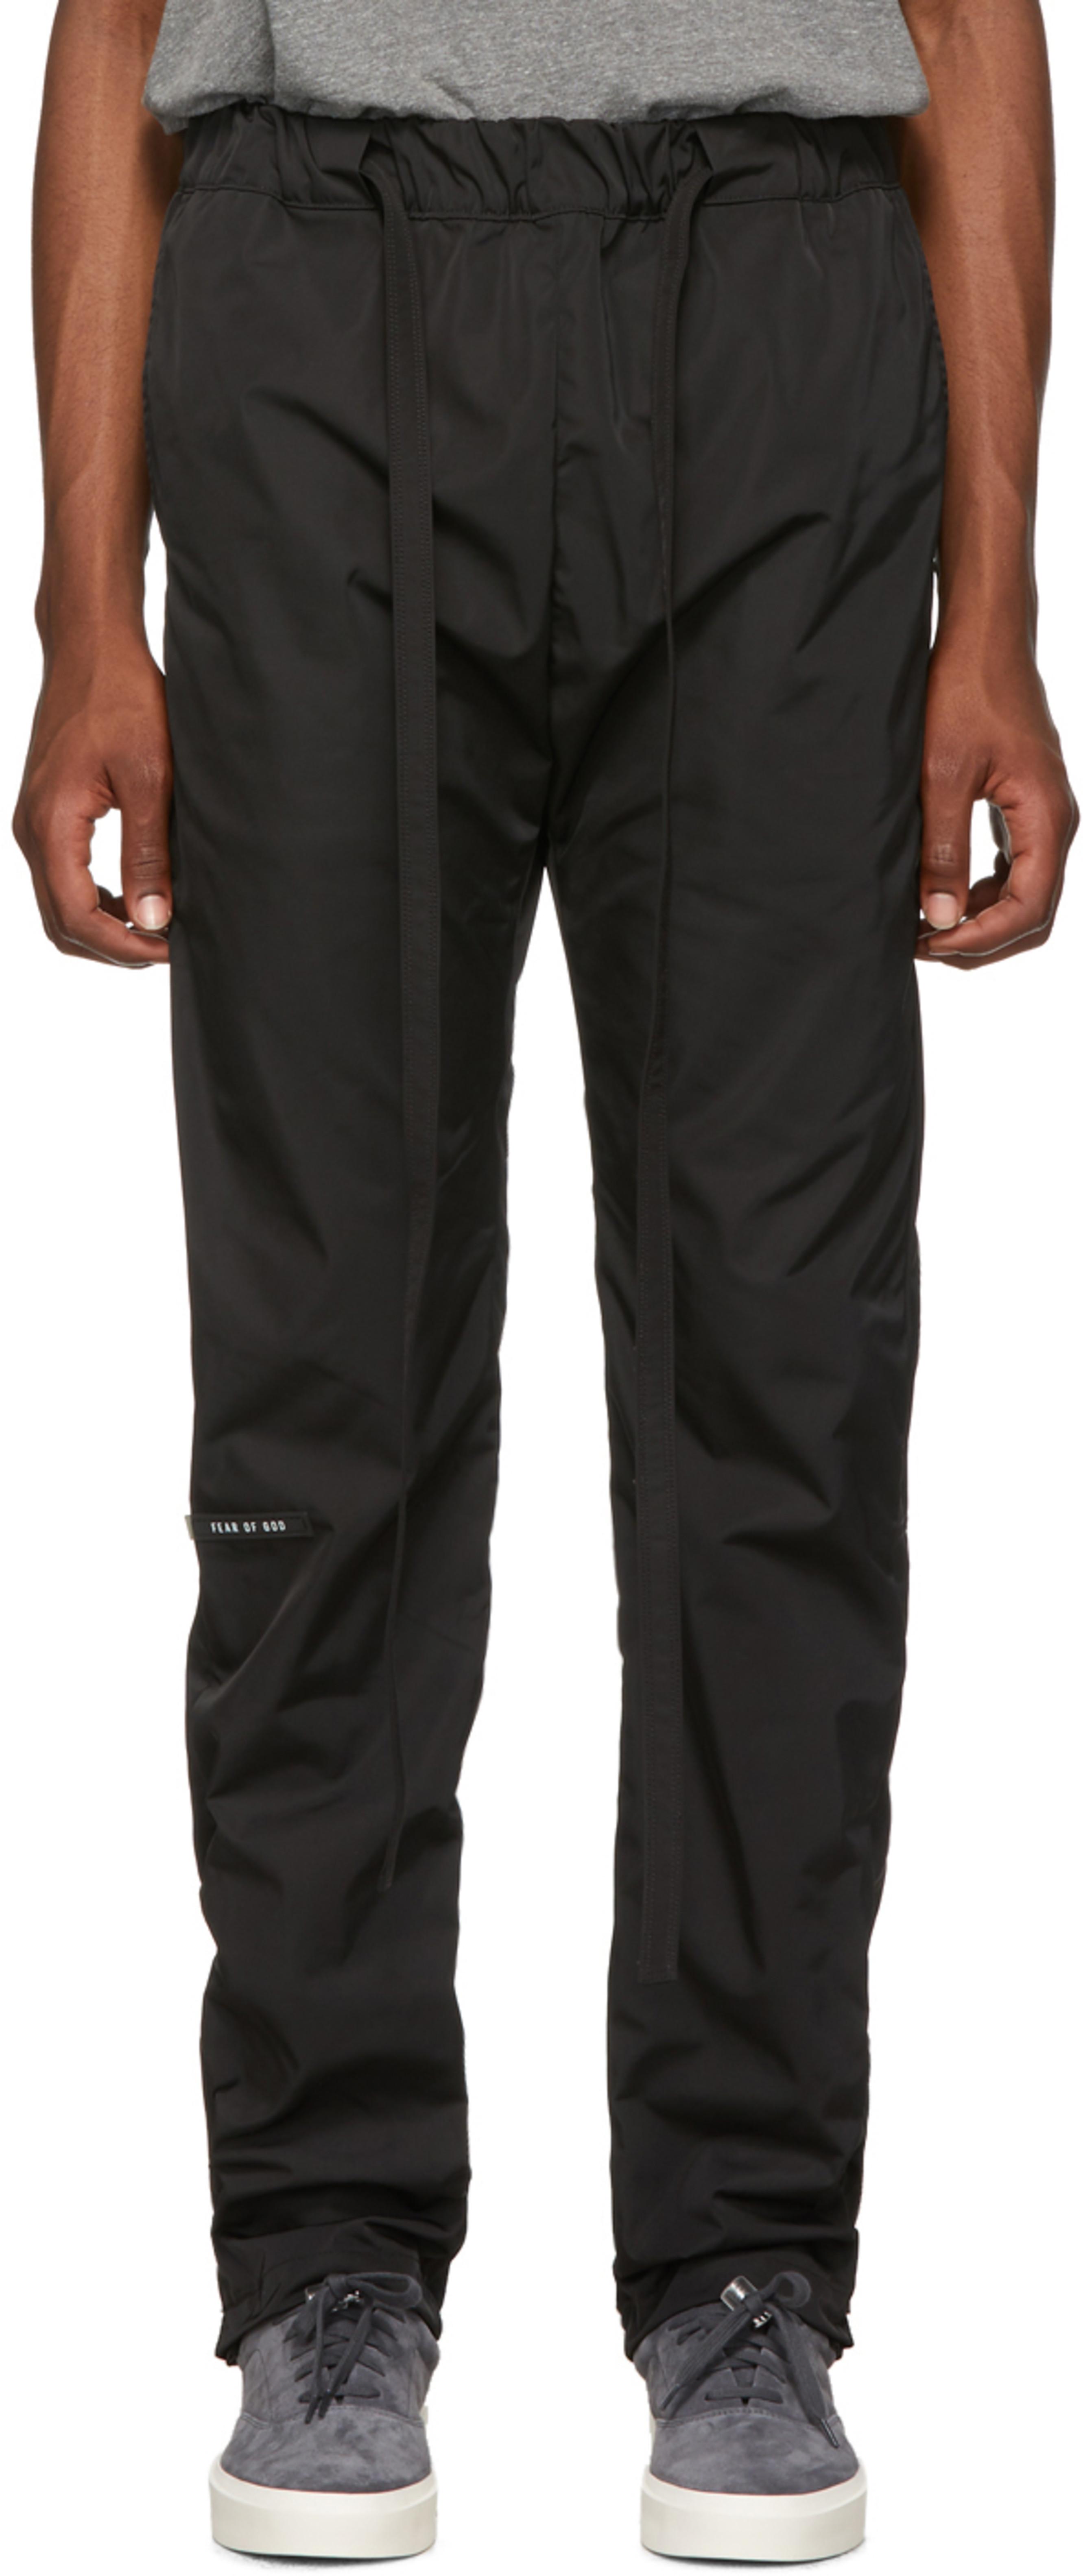 0658a95d987fd5 Designer pants for Men   SSENSE